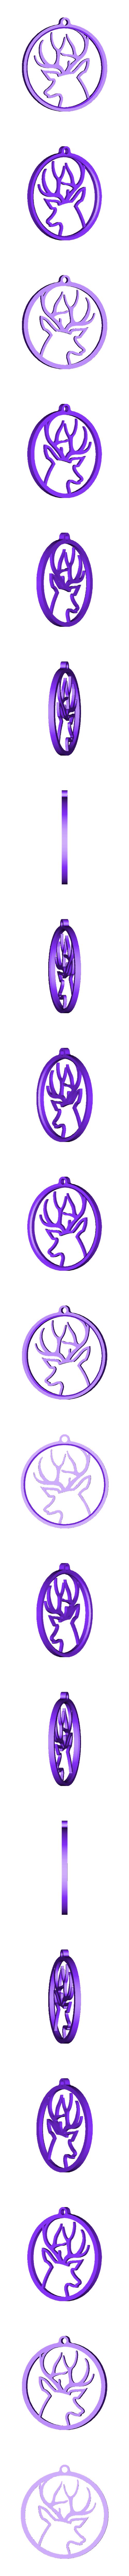 AnnikaDear_line.stl Download free STL file Deer - Christmas ornament • 3D print object, fusefactory